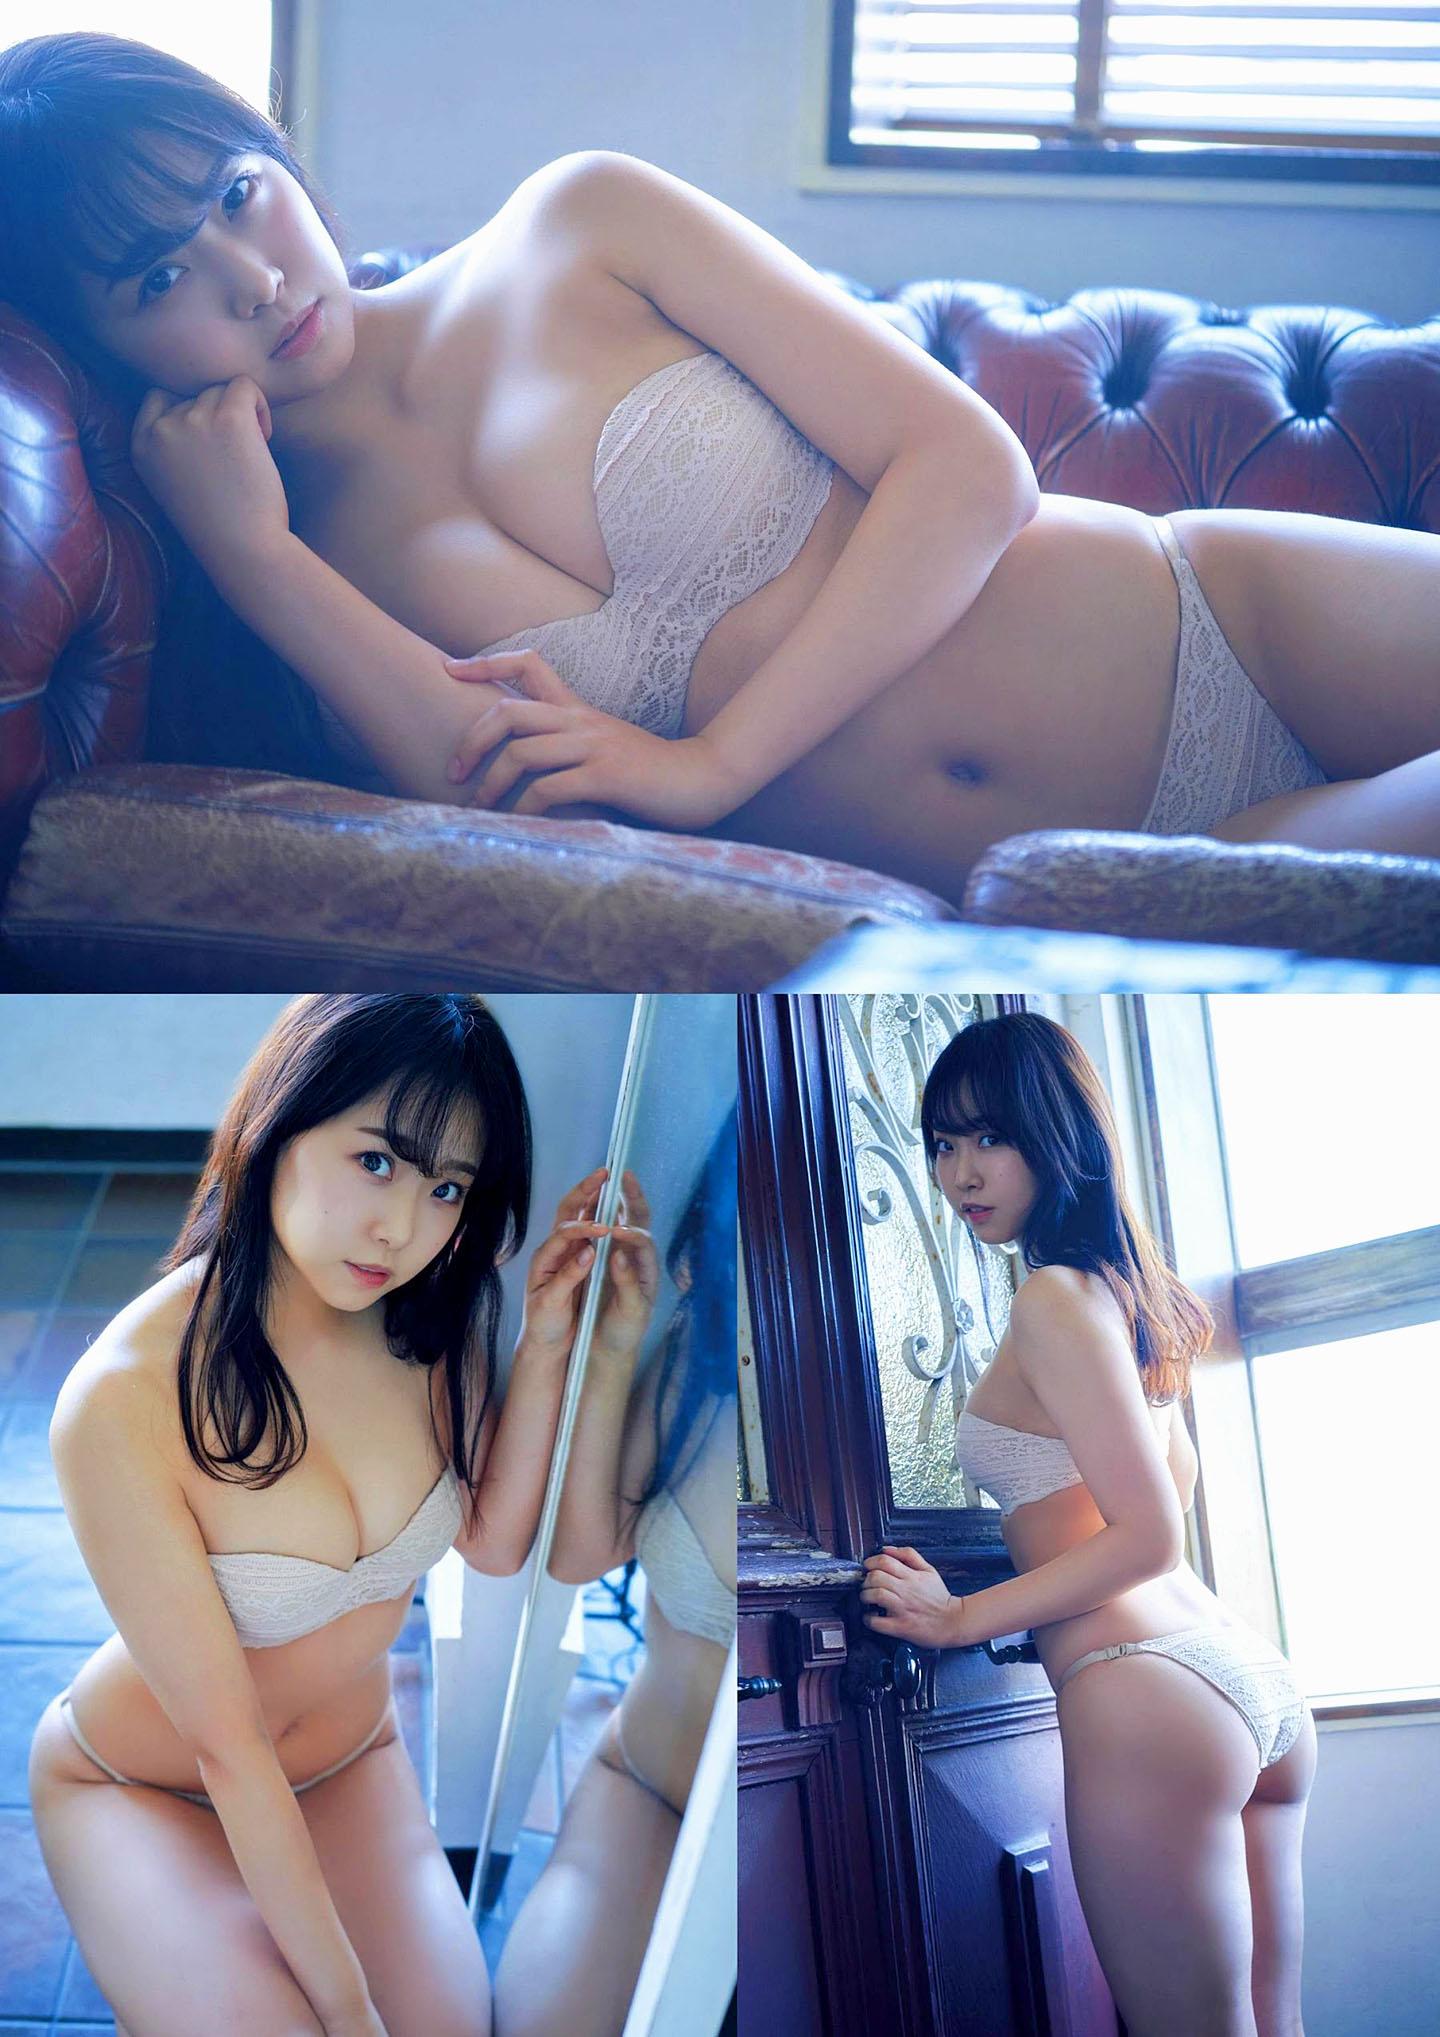 Yuuka Kato NMB48 EnTame 210304 05.jpg